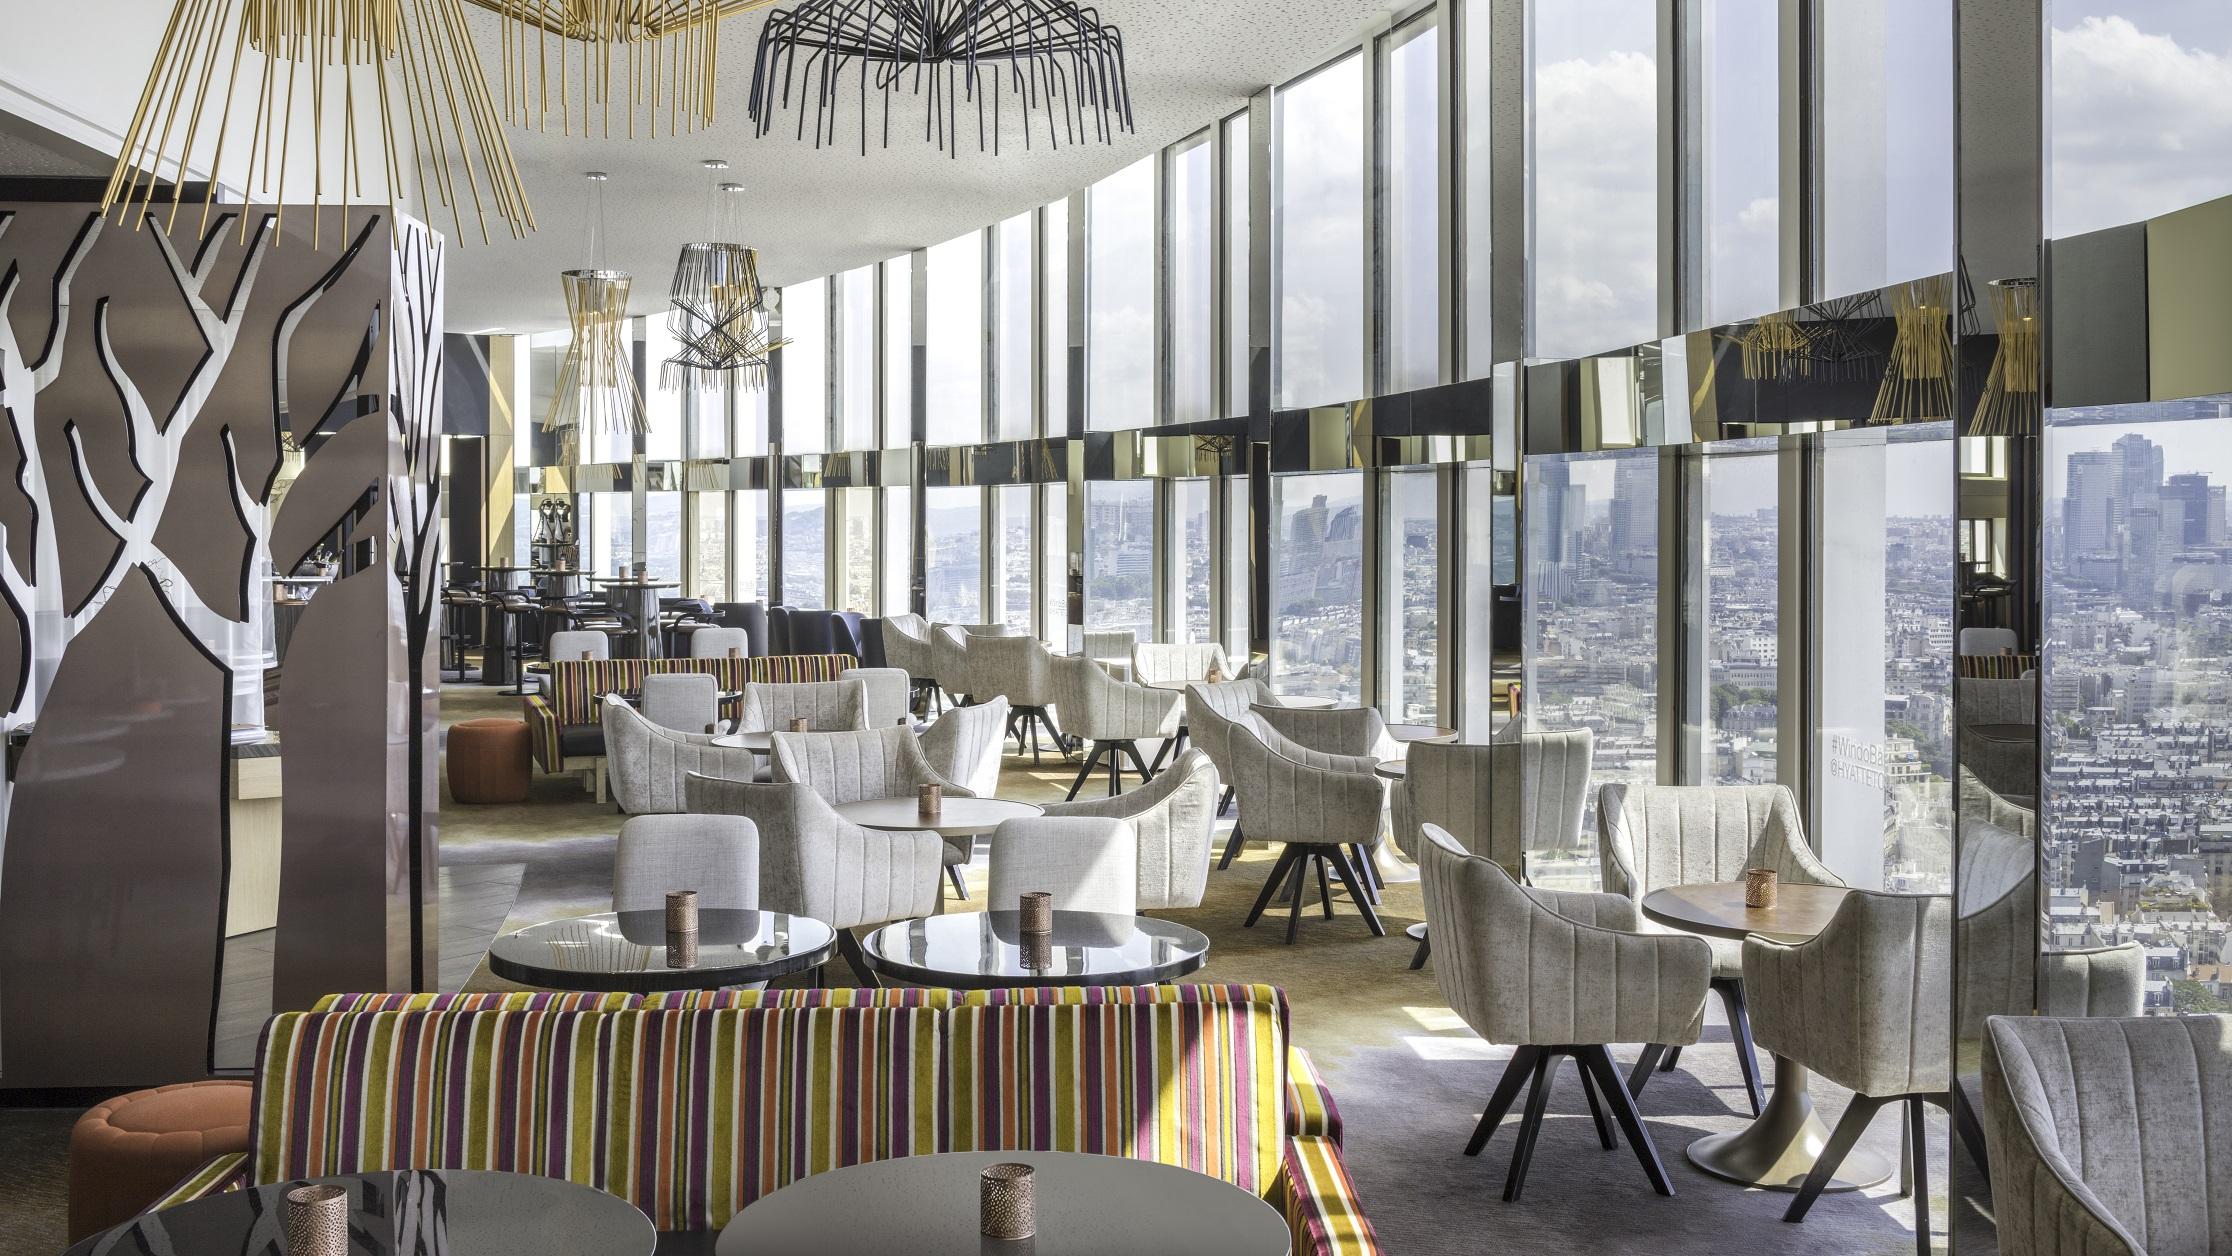 Hyatt-Regency-Paris-Etoile-Windo-Skybar-4.jpg